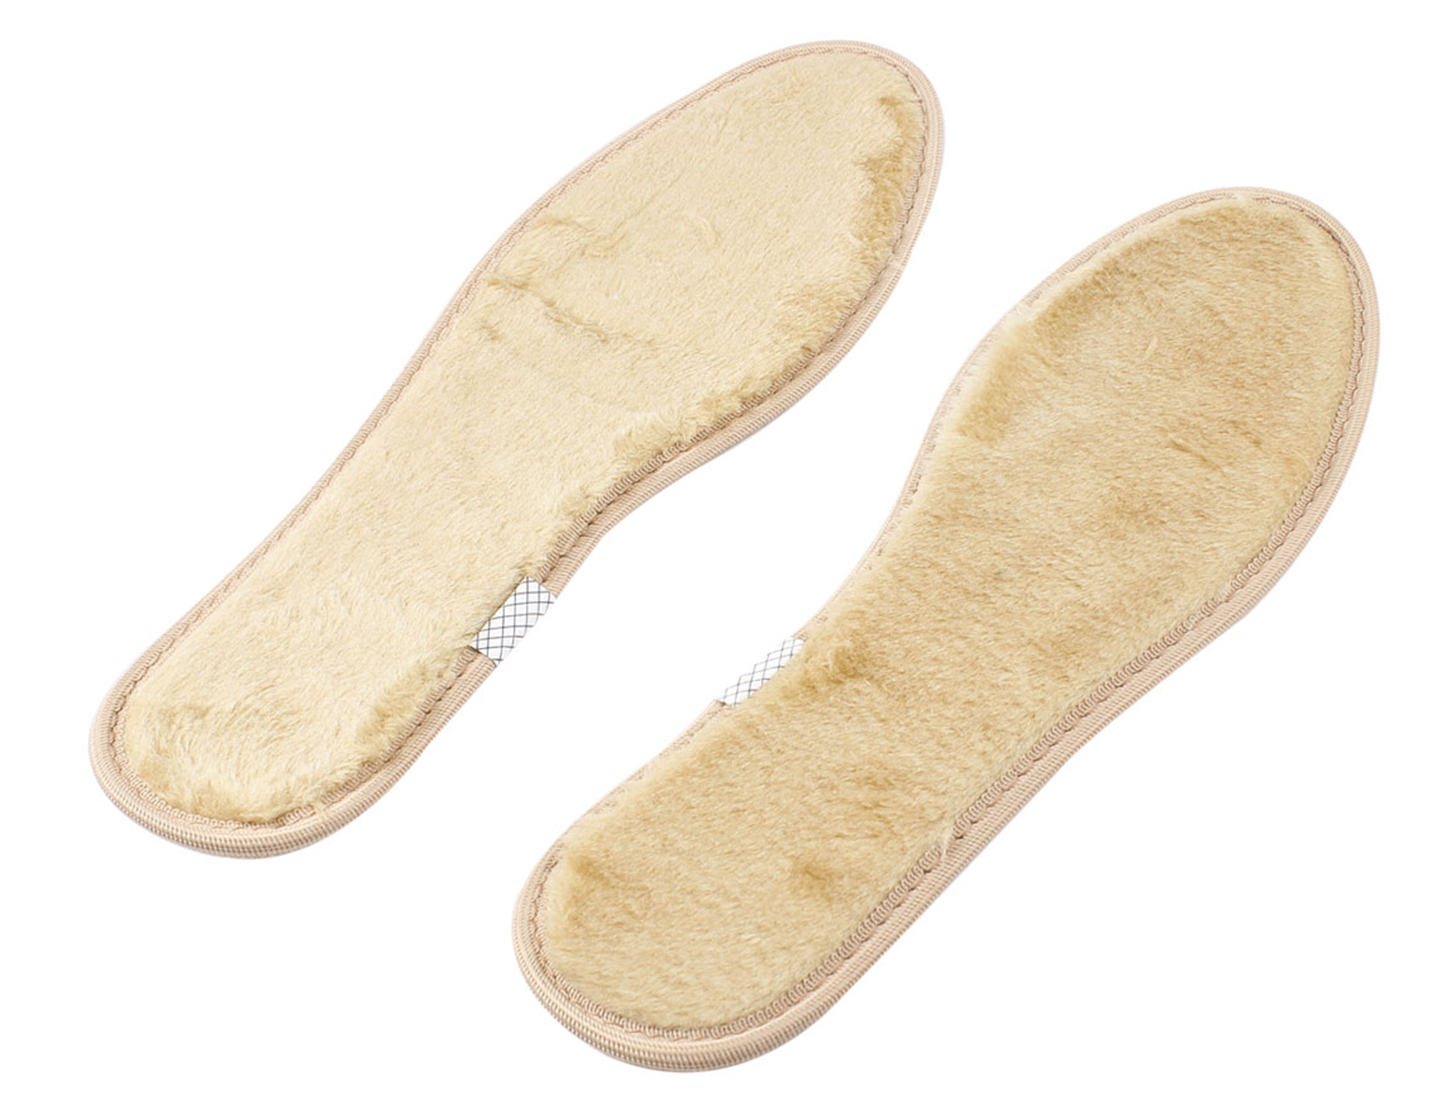 Women Pair Khaki Winter Warm Plush Boots Shoe Insert Pad Insole US 7.5